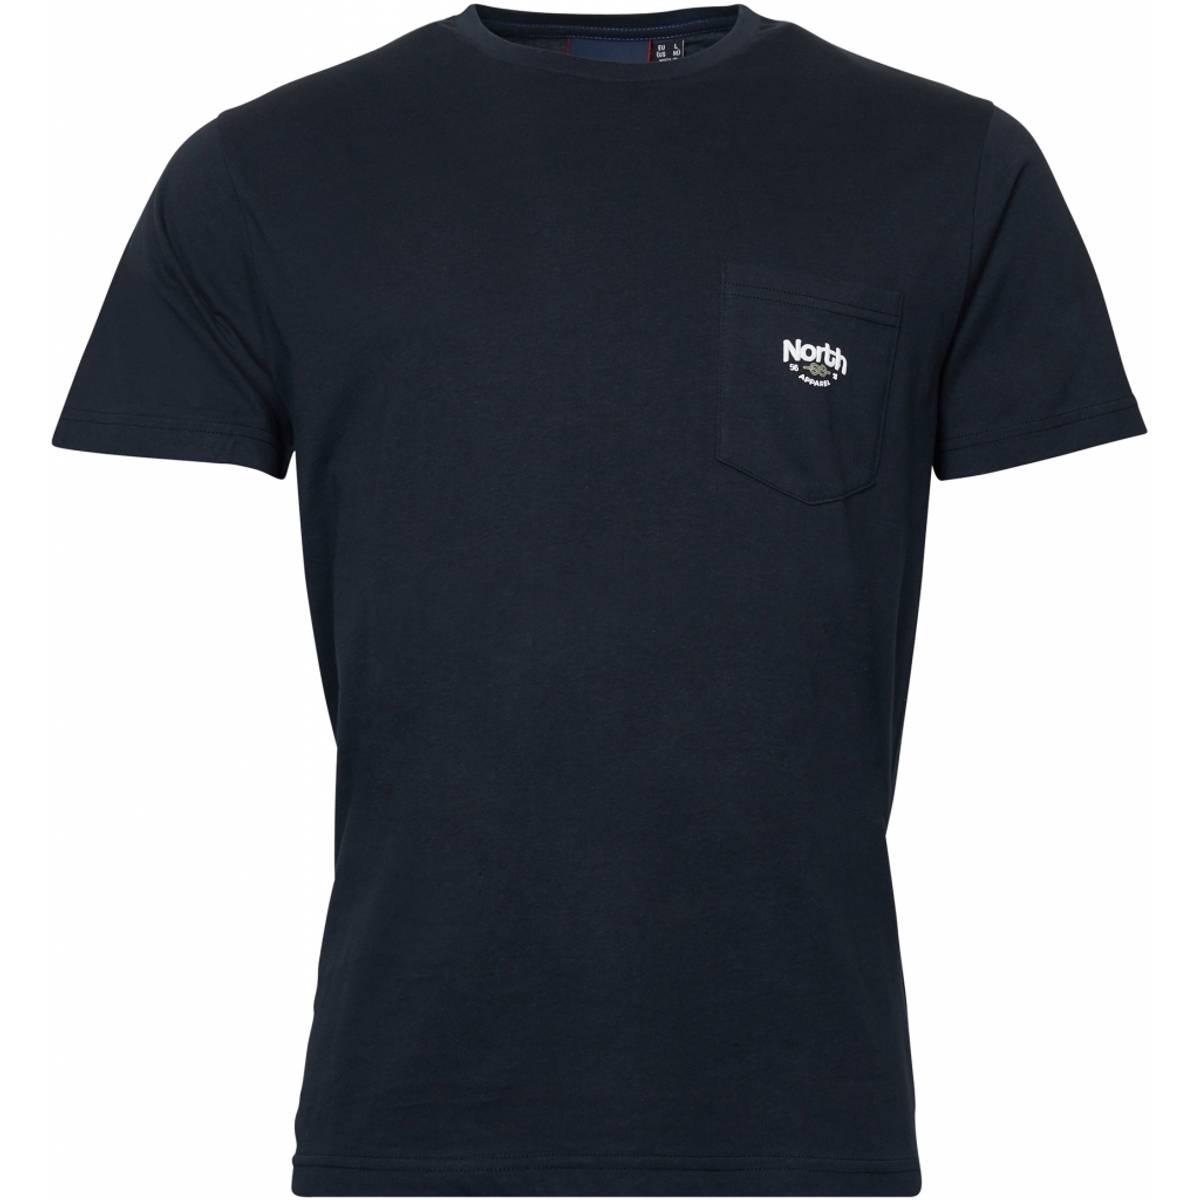 North 56°4 printed T-shirt - Sort